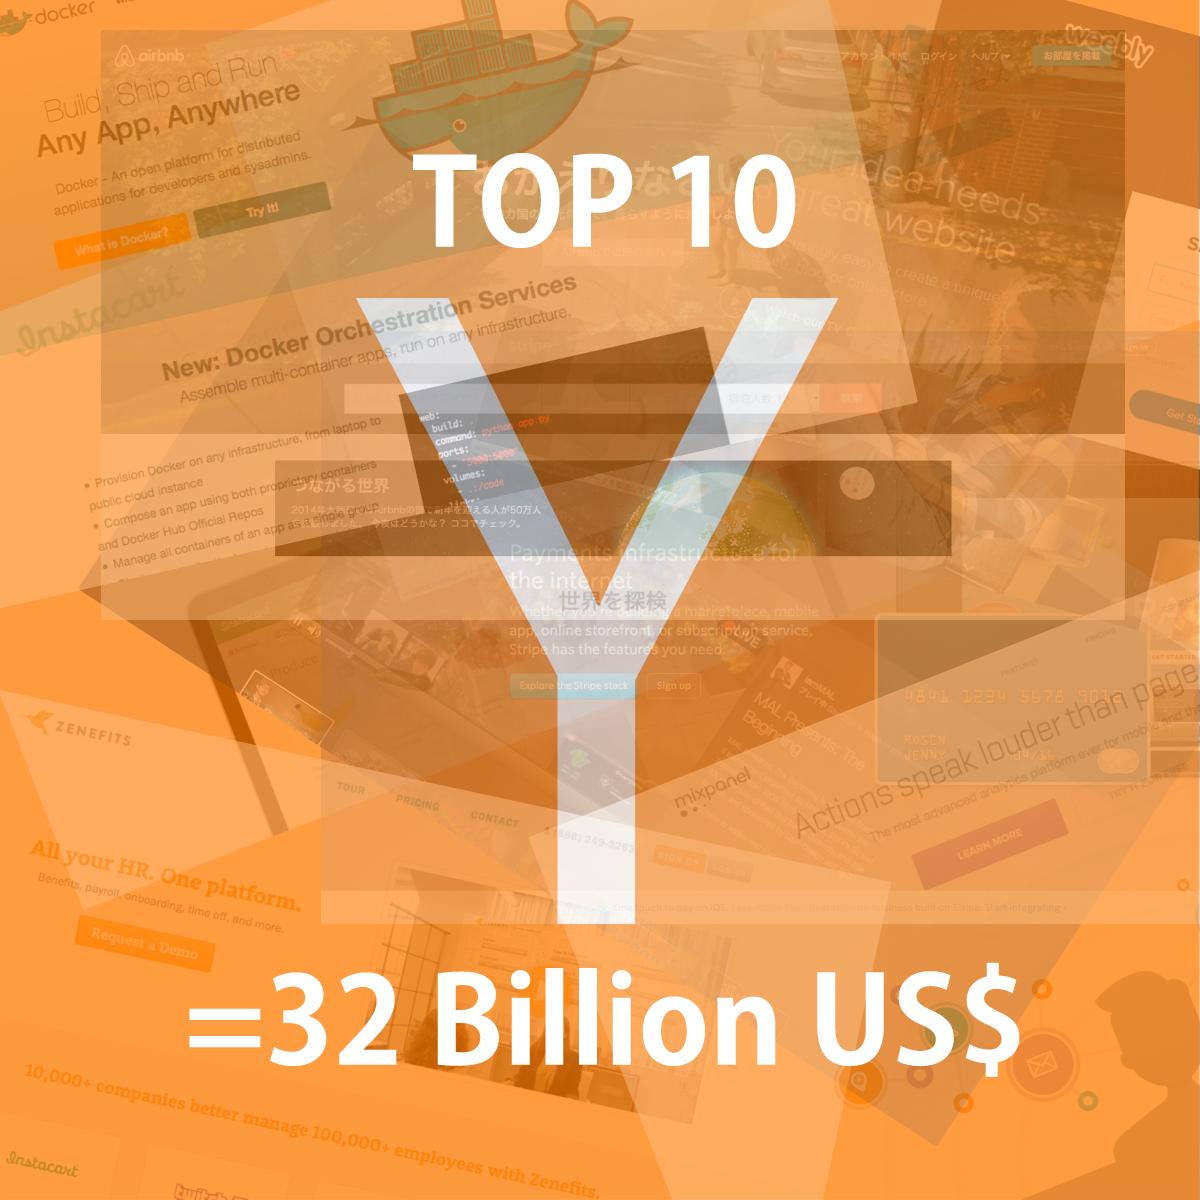 Y Combinatorの投資先スタートアップTOP10は企業価値合計3.2兆円!